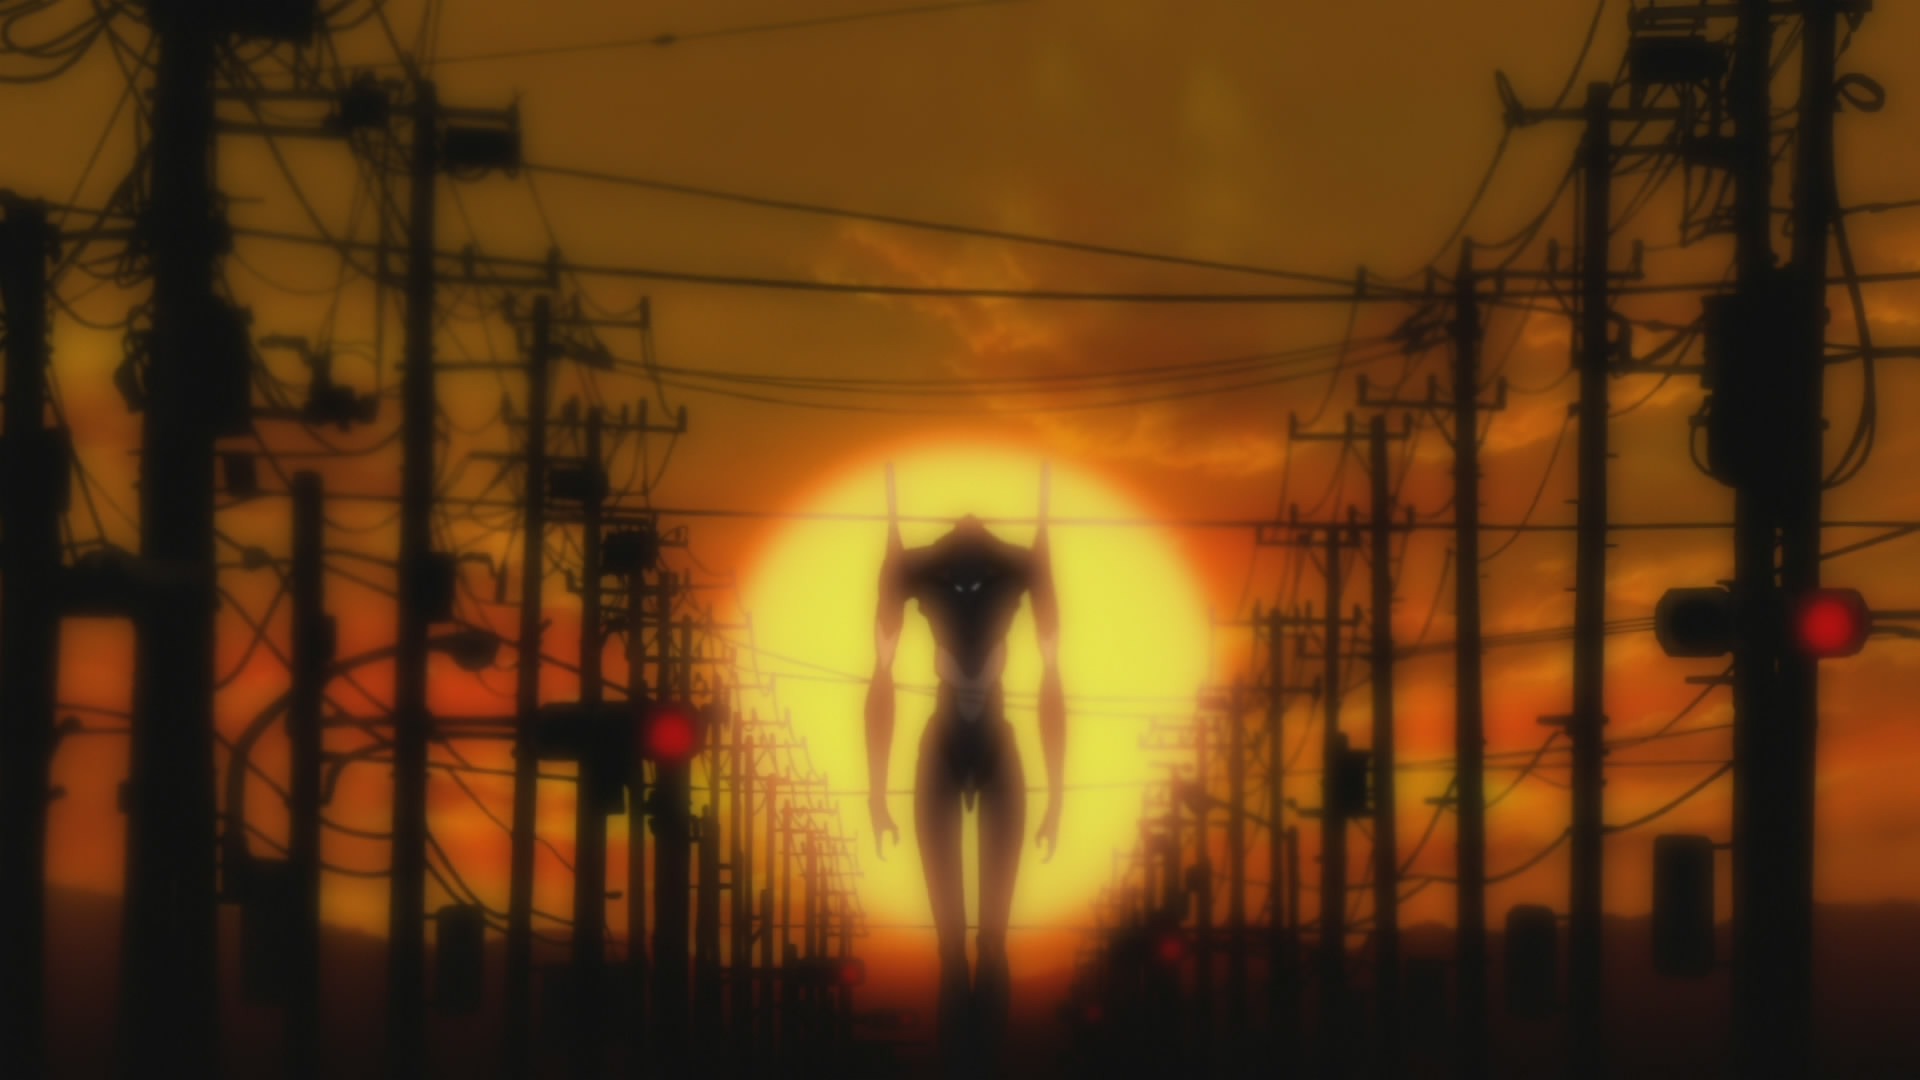 evangelion wallpaper hd anime - photo #44